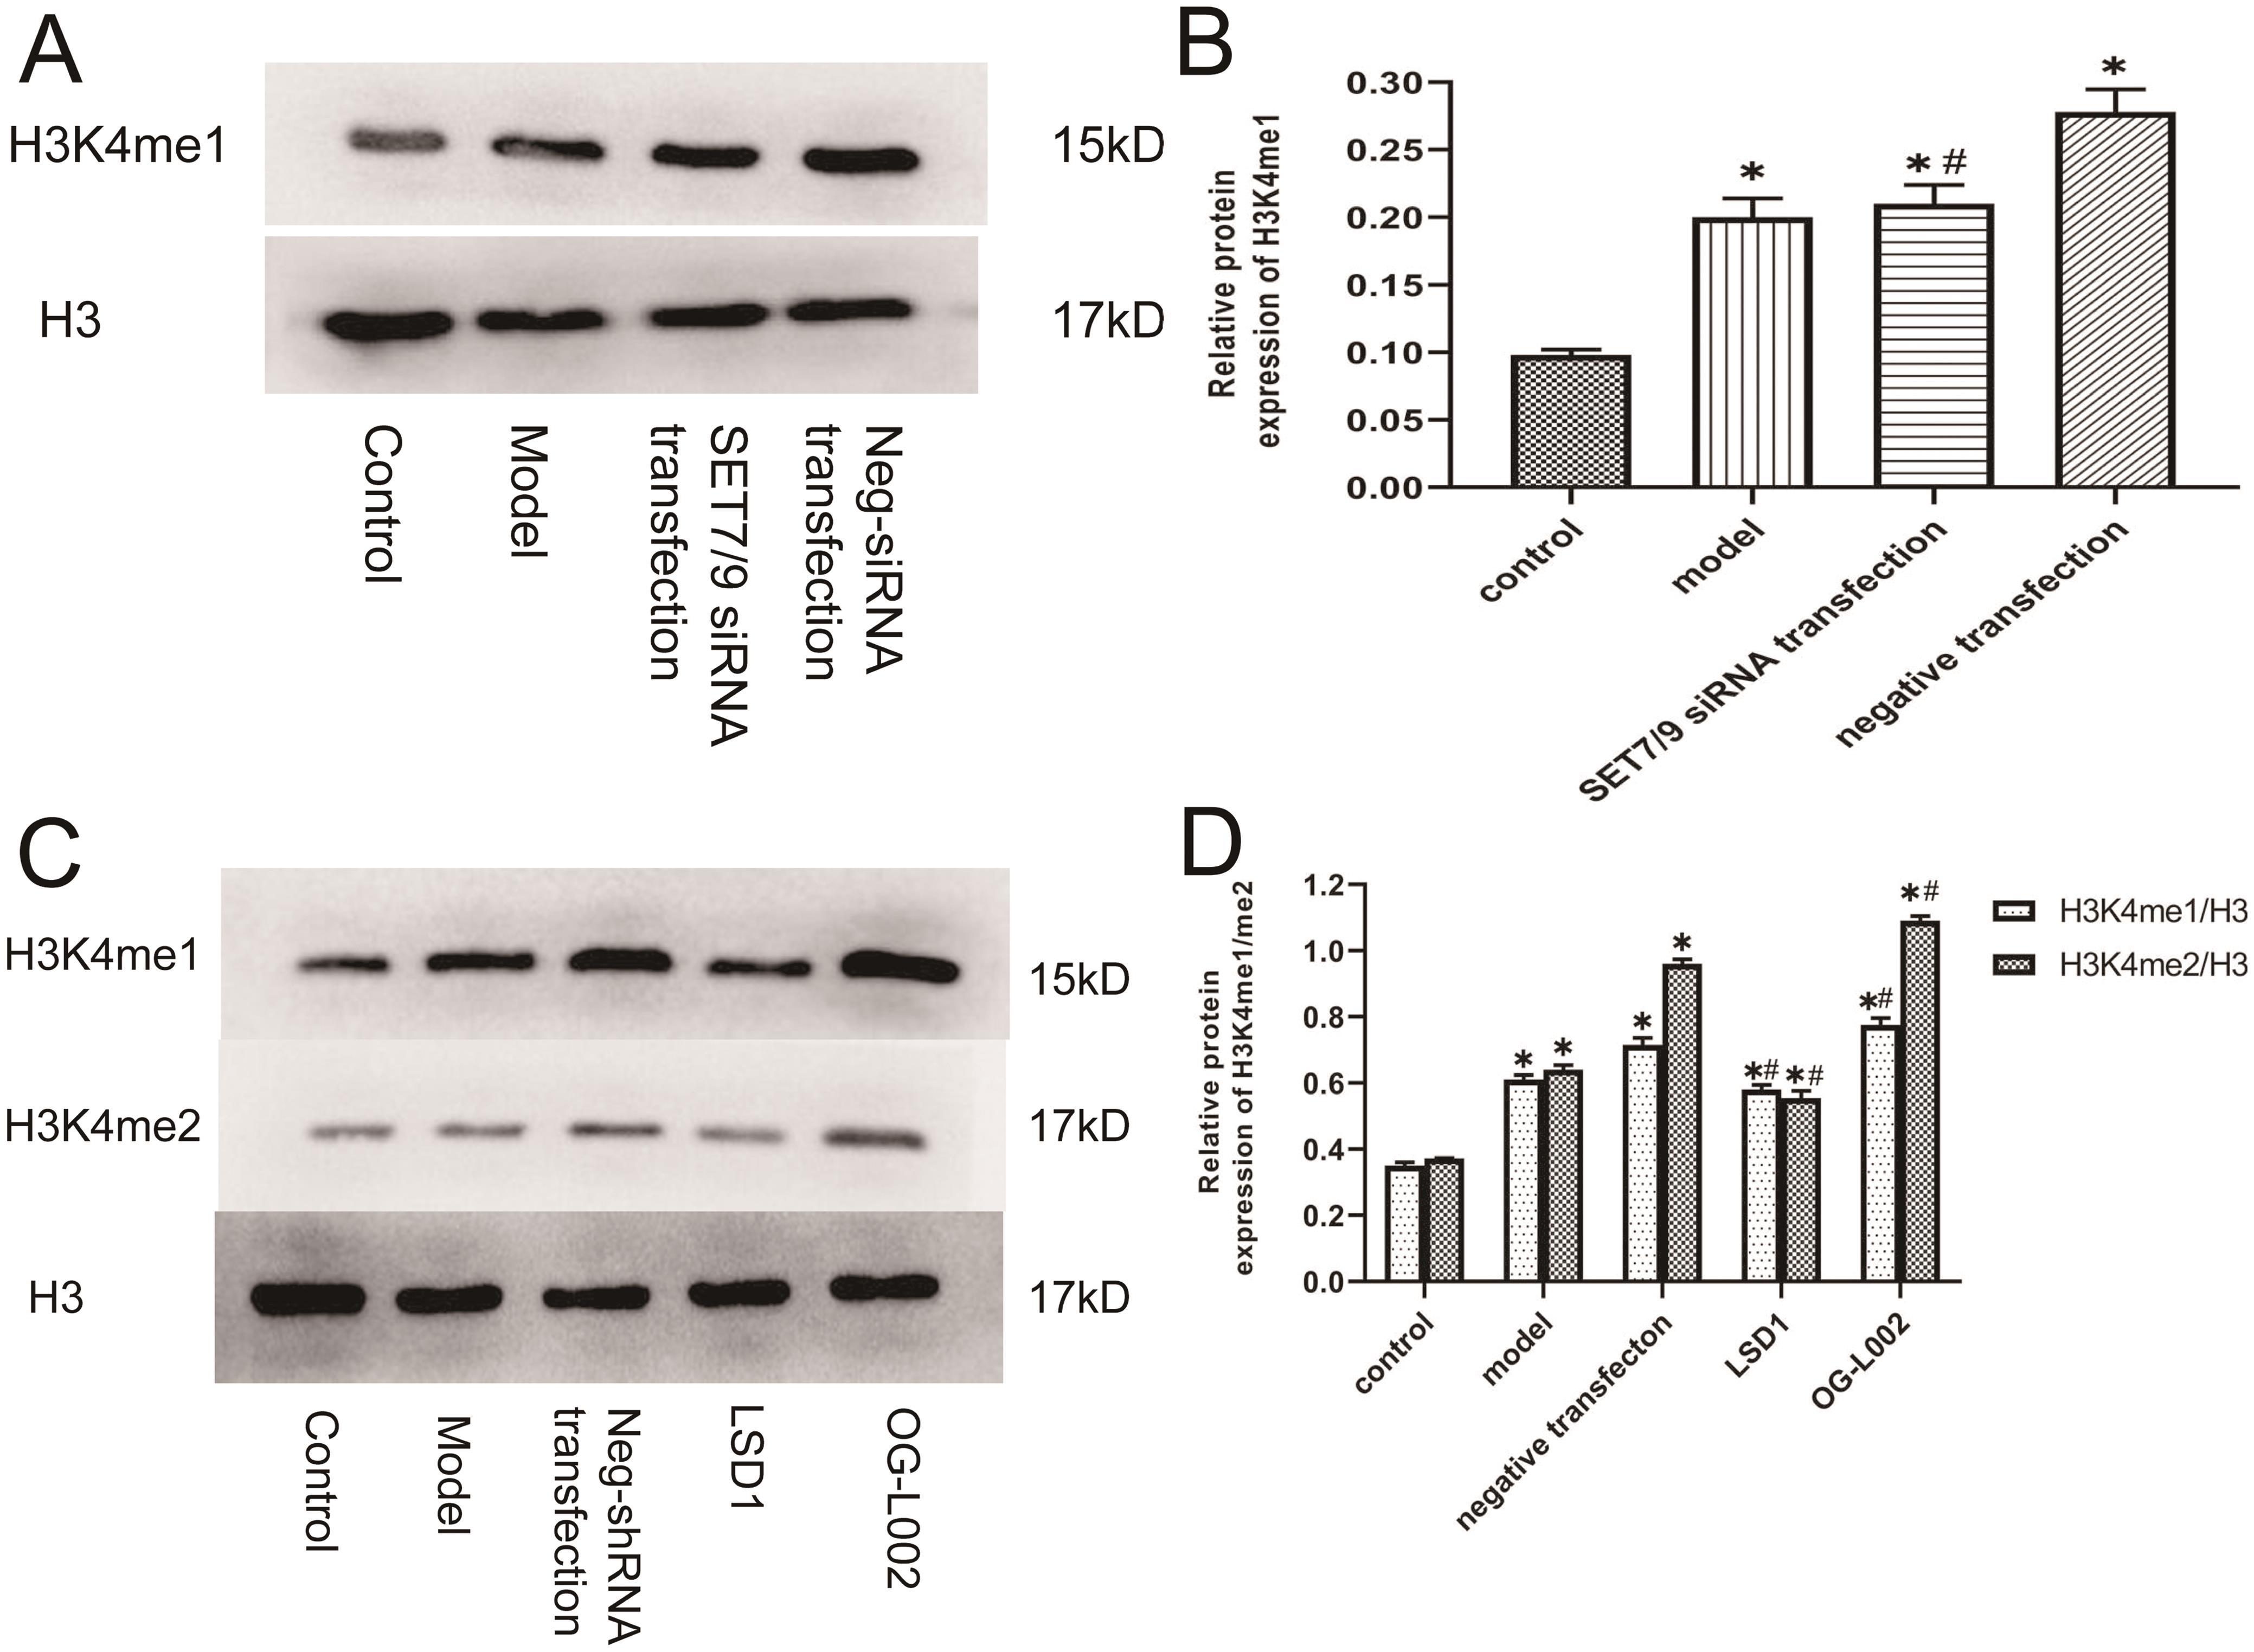 Effect of arsenic on H3K4 methylation in L02 hepatocytes.